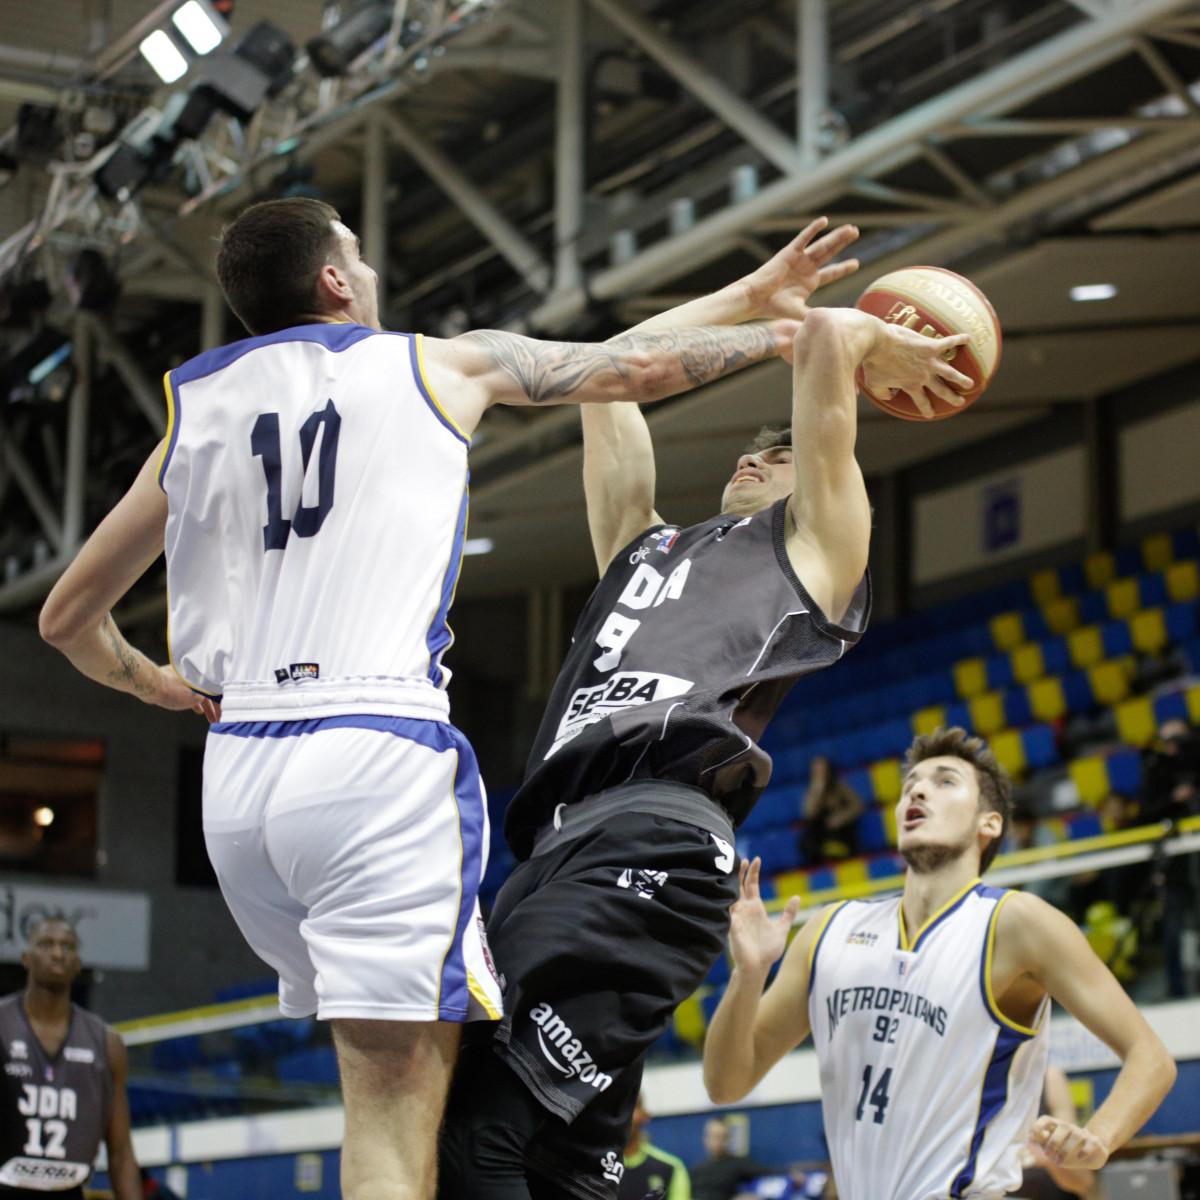 Photo of Dimitri Radnic, 2019-2020 season